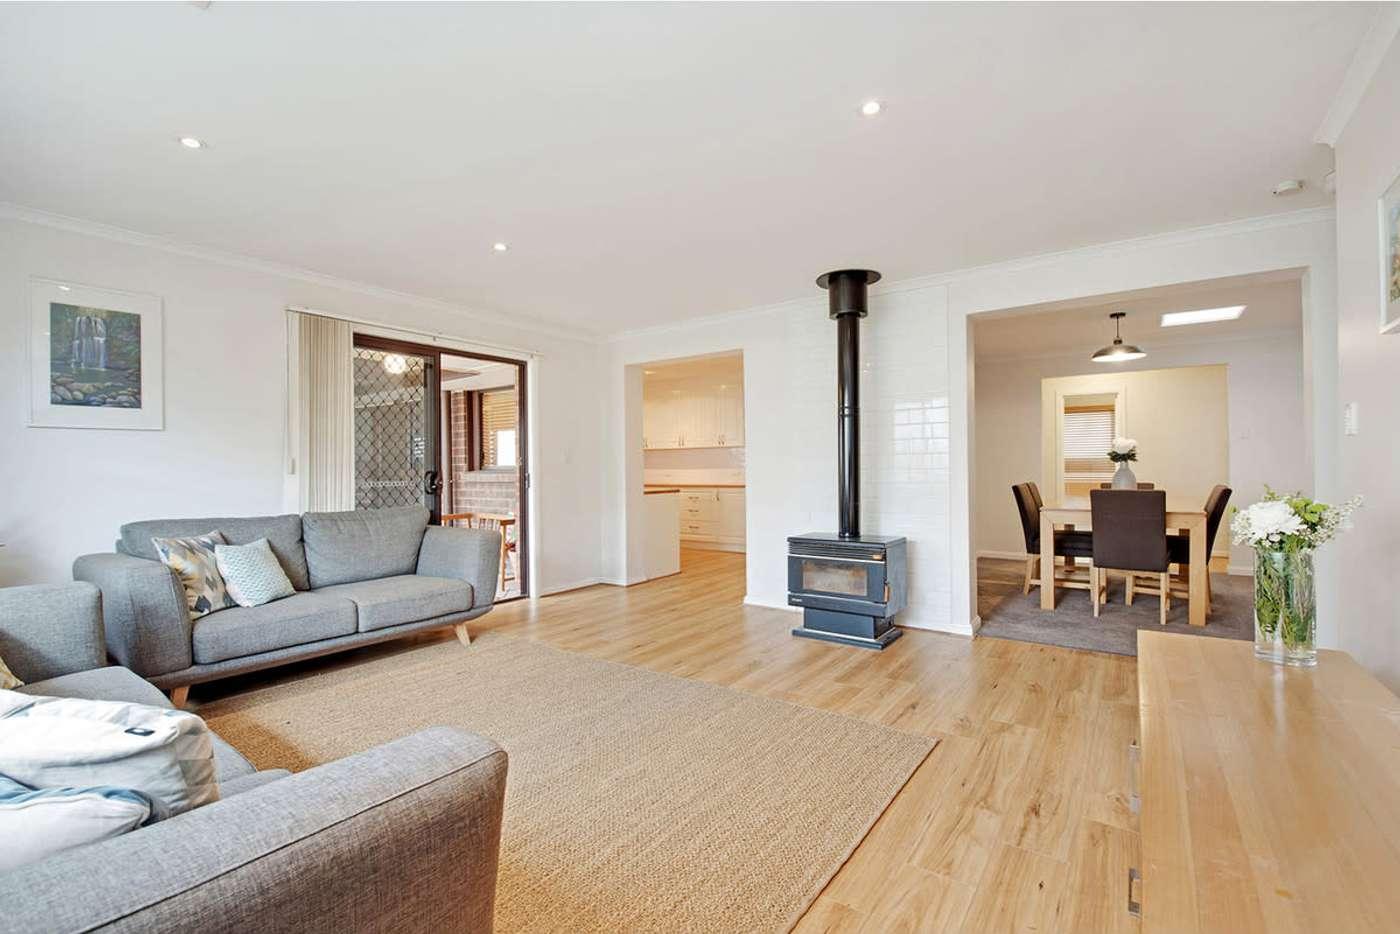 Main view of Homely house listing, 3 Andrea Street, Highbury SA 5089